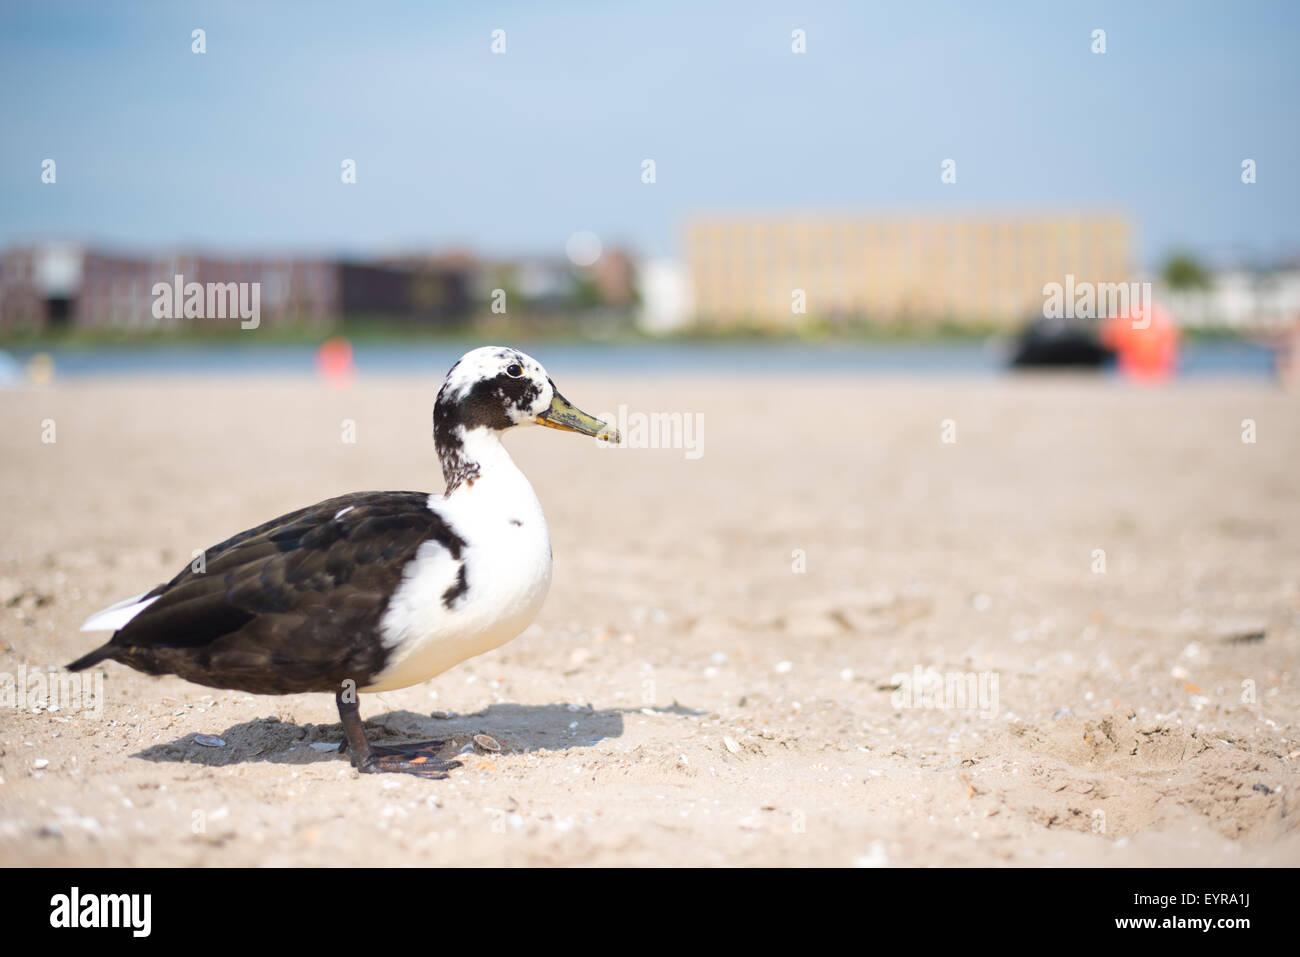 Black & White Ancona duck on a beach in Diemerpark city park